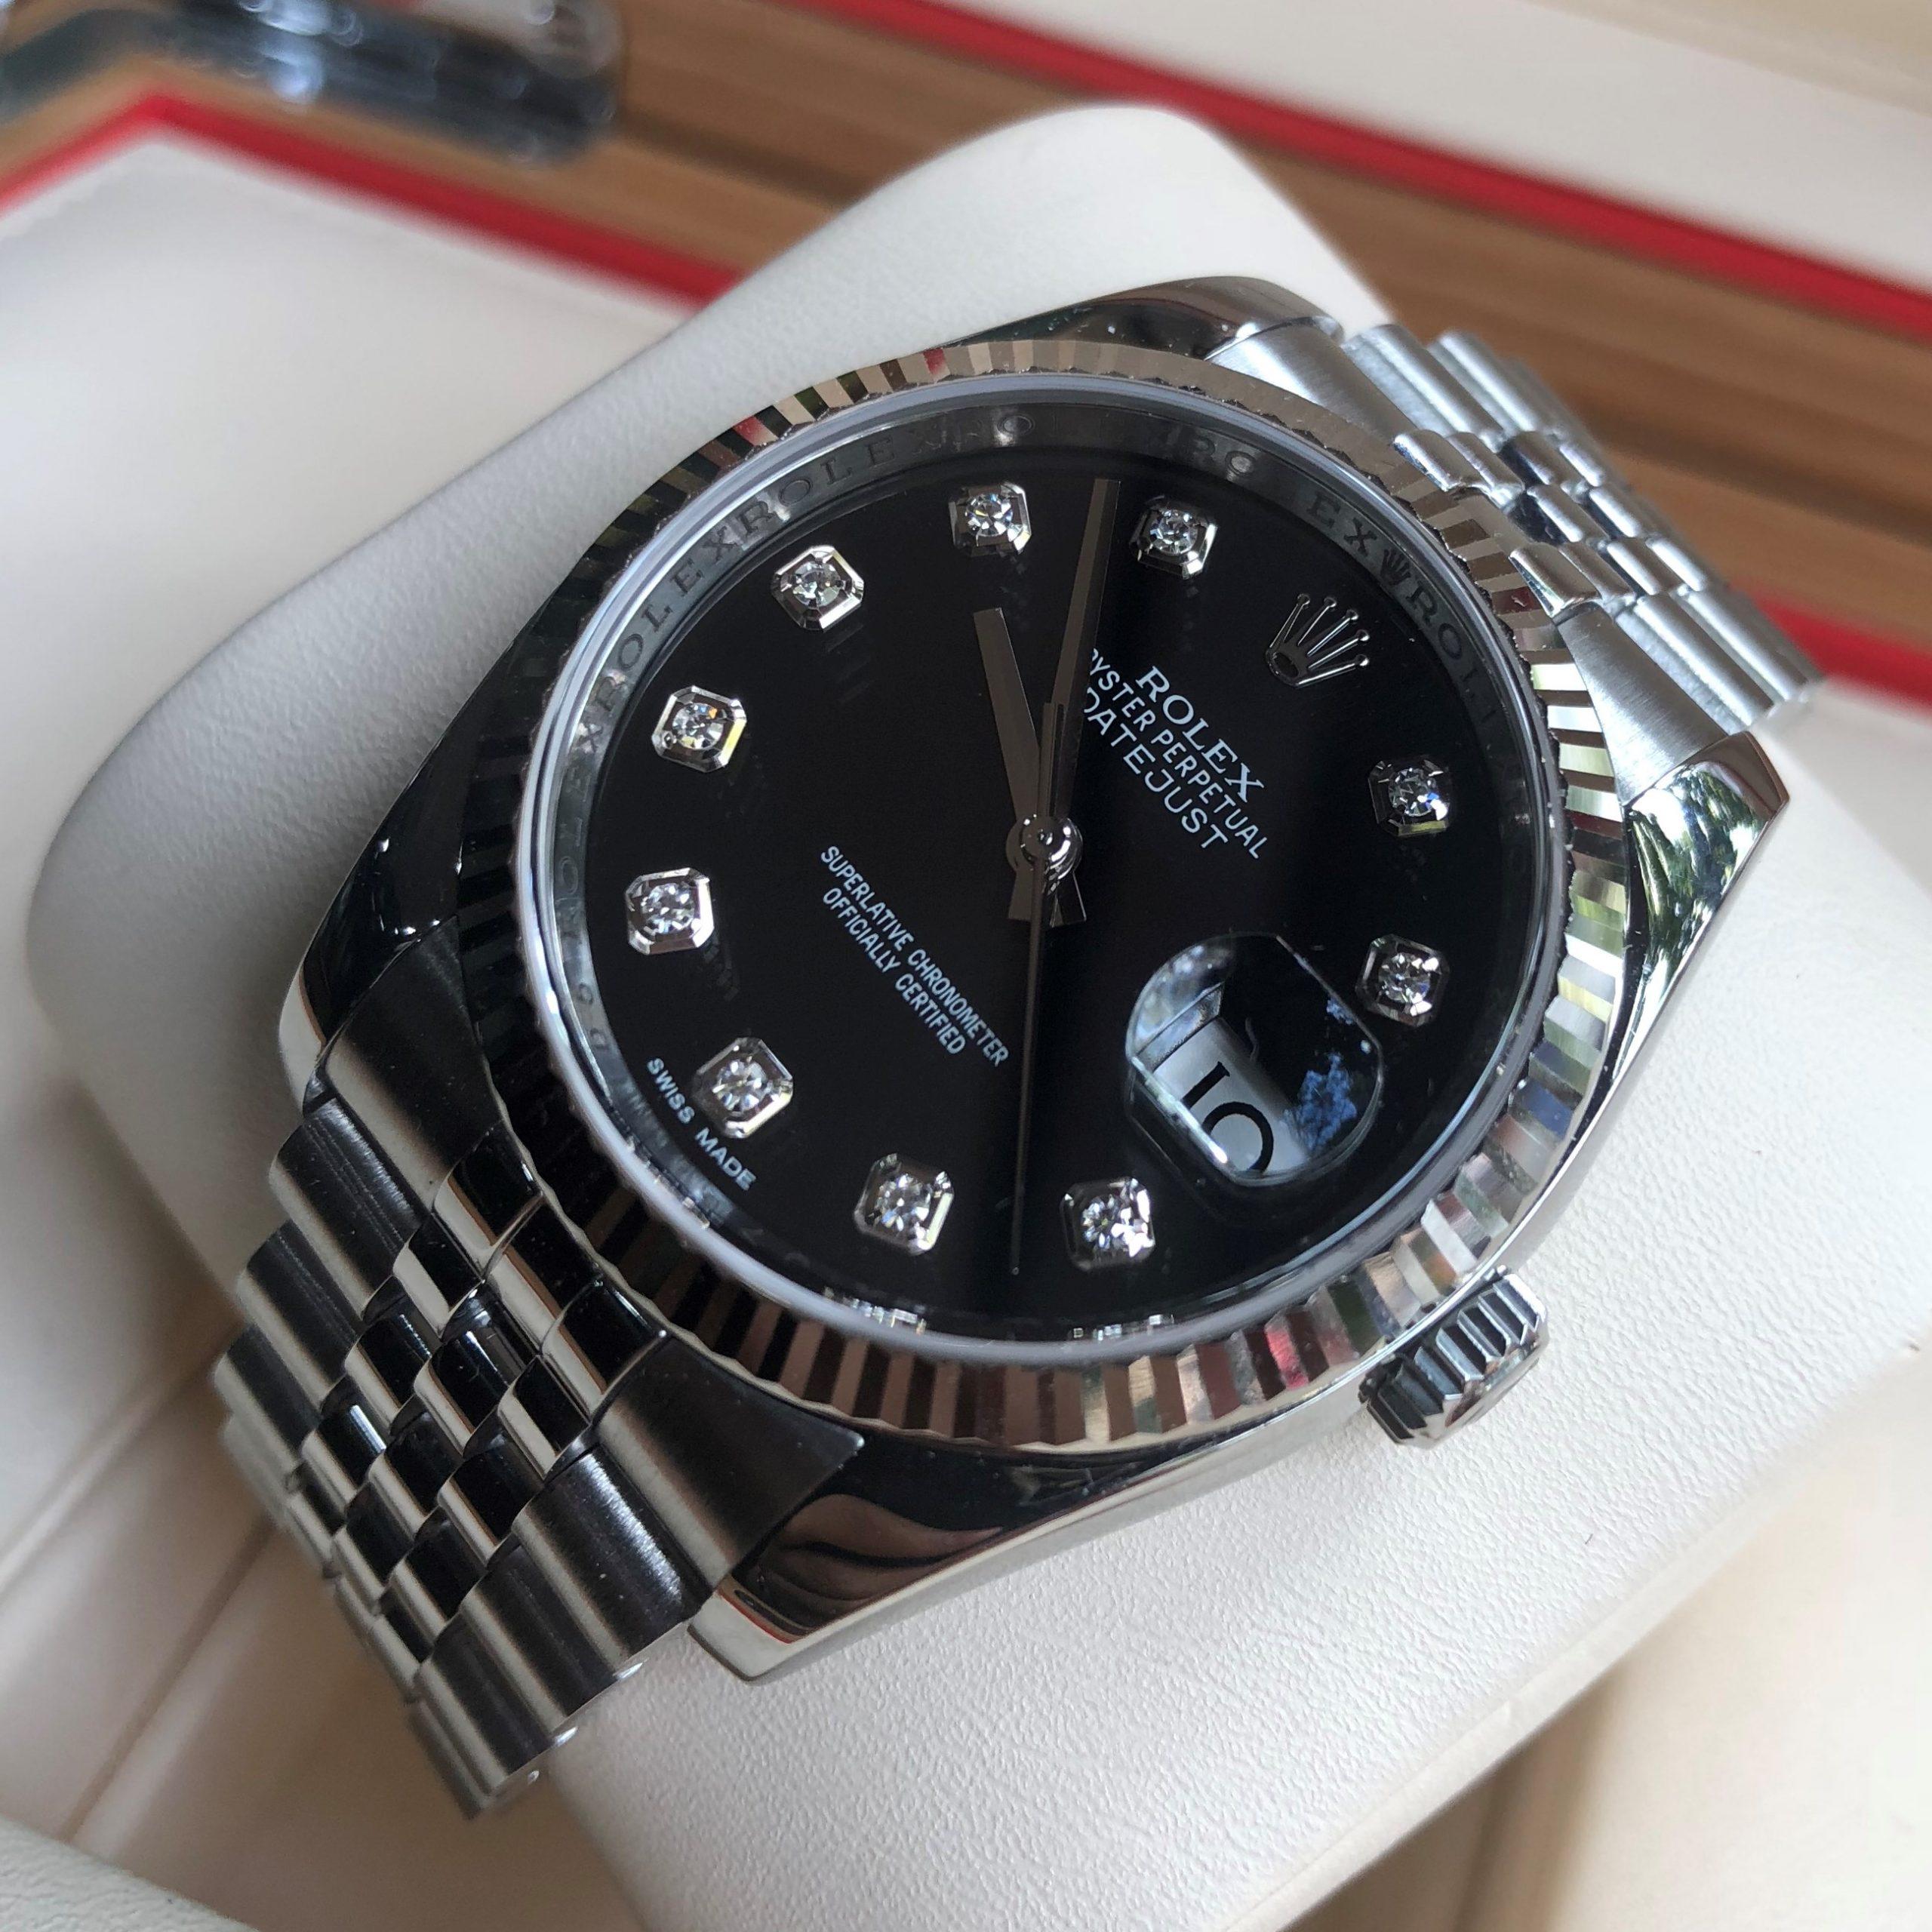 Rolex 116234 mặt đen cọc số Diamond Size 36mm đời 2016/2017